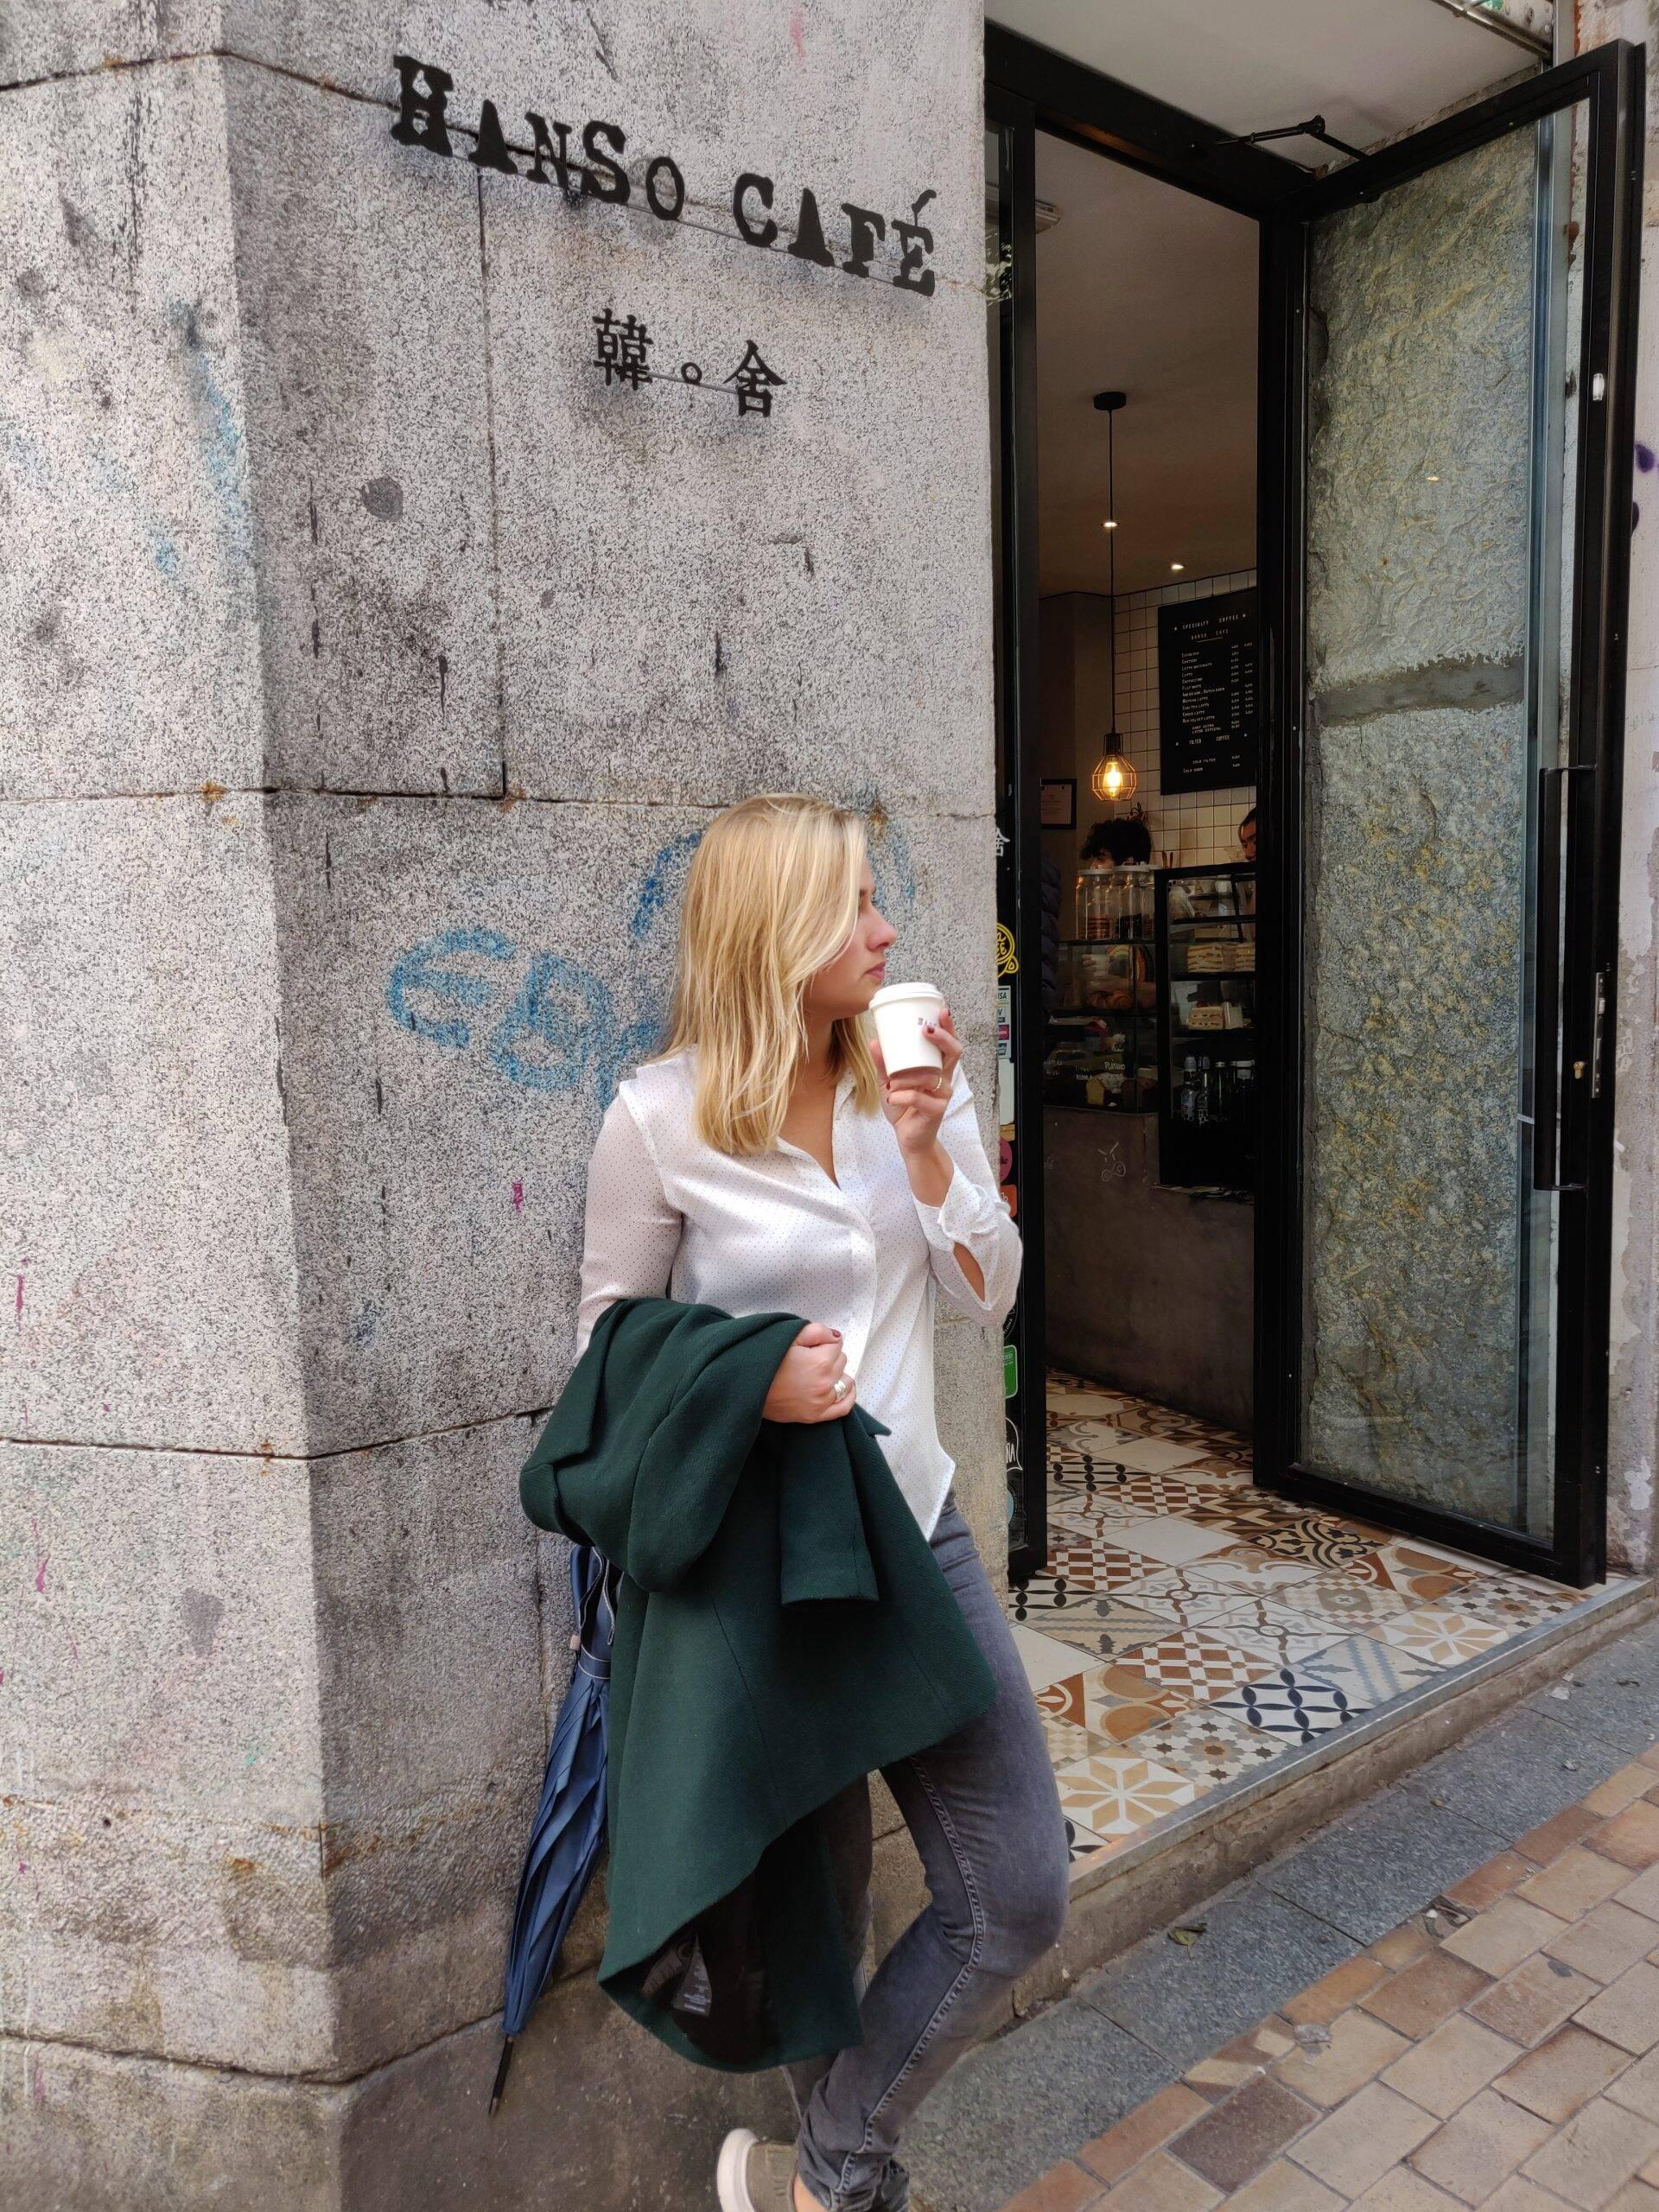 HanSo Café in Madrid